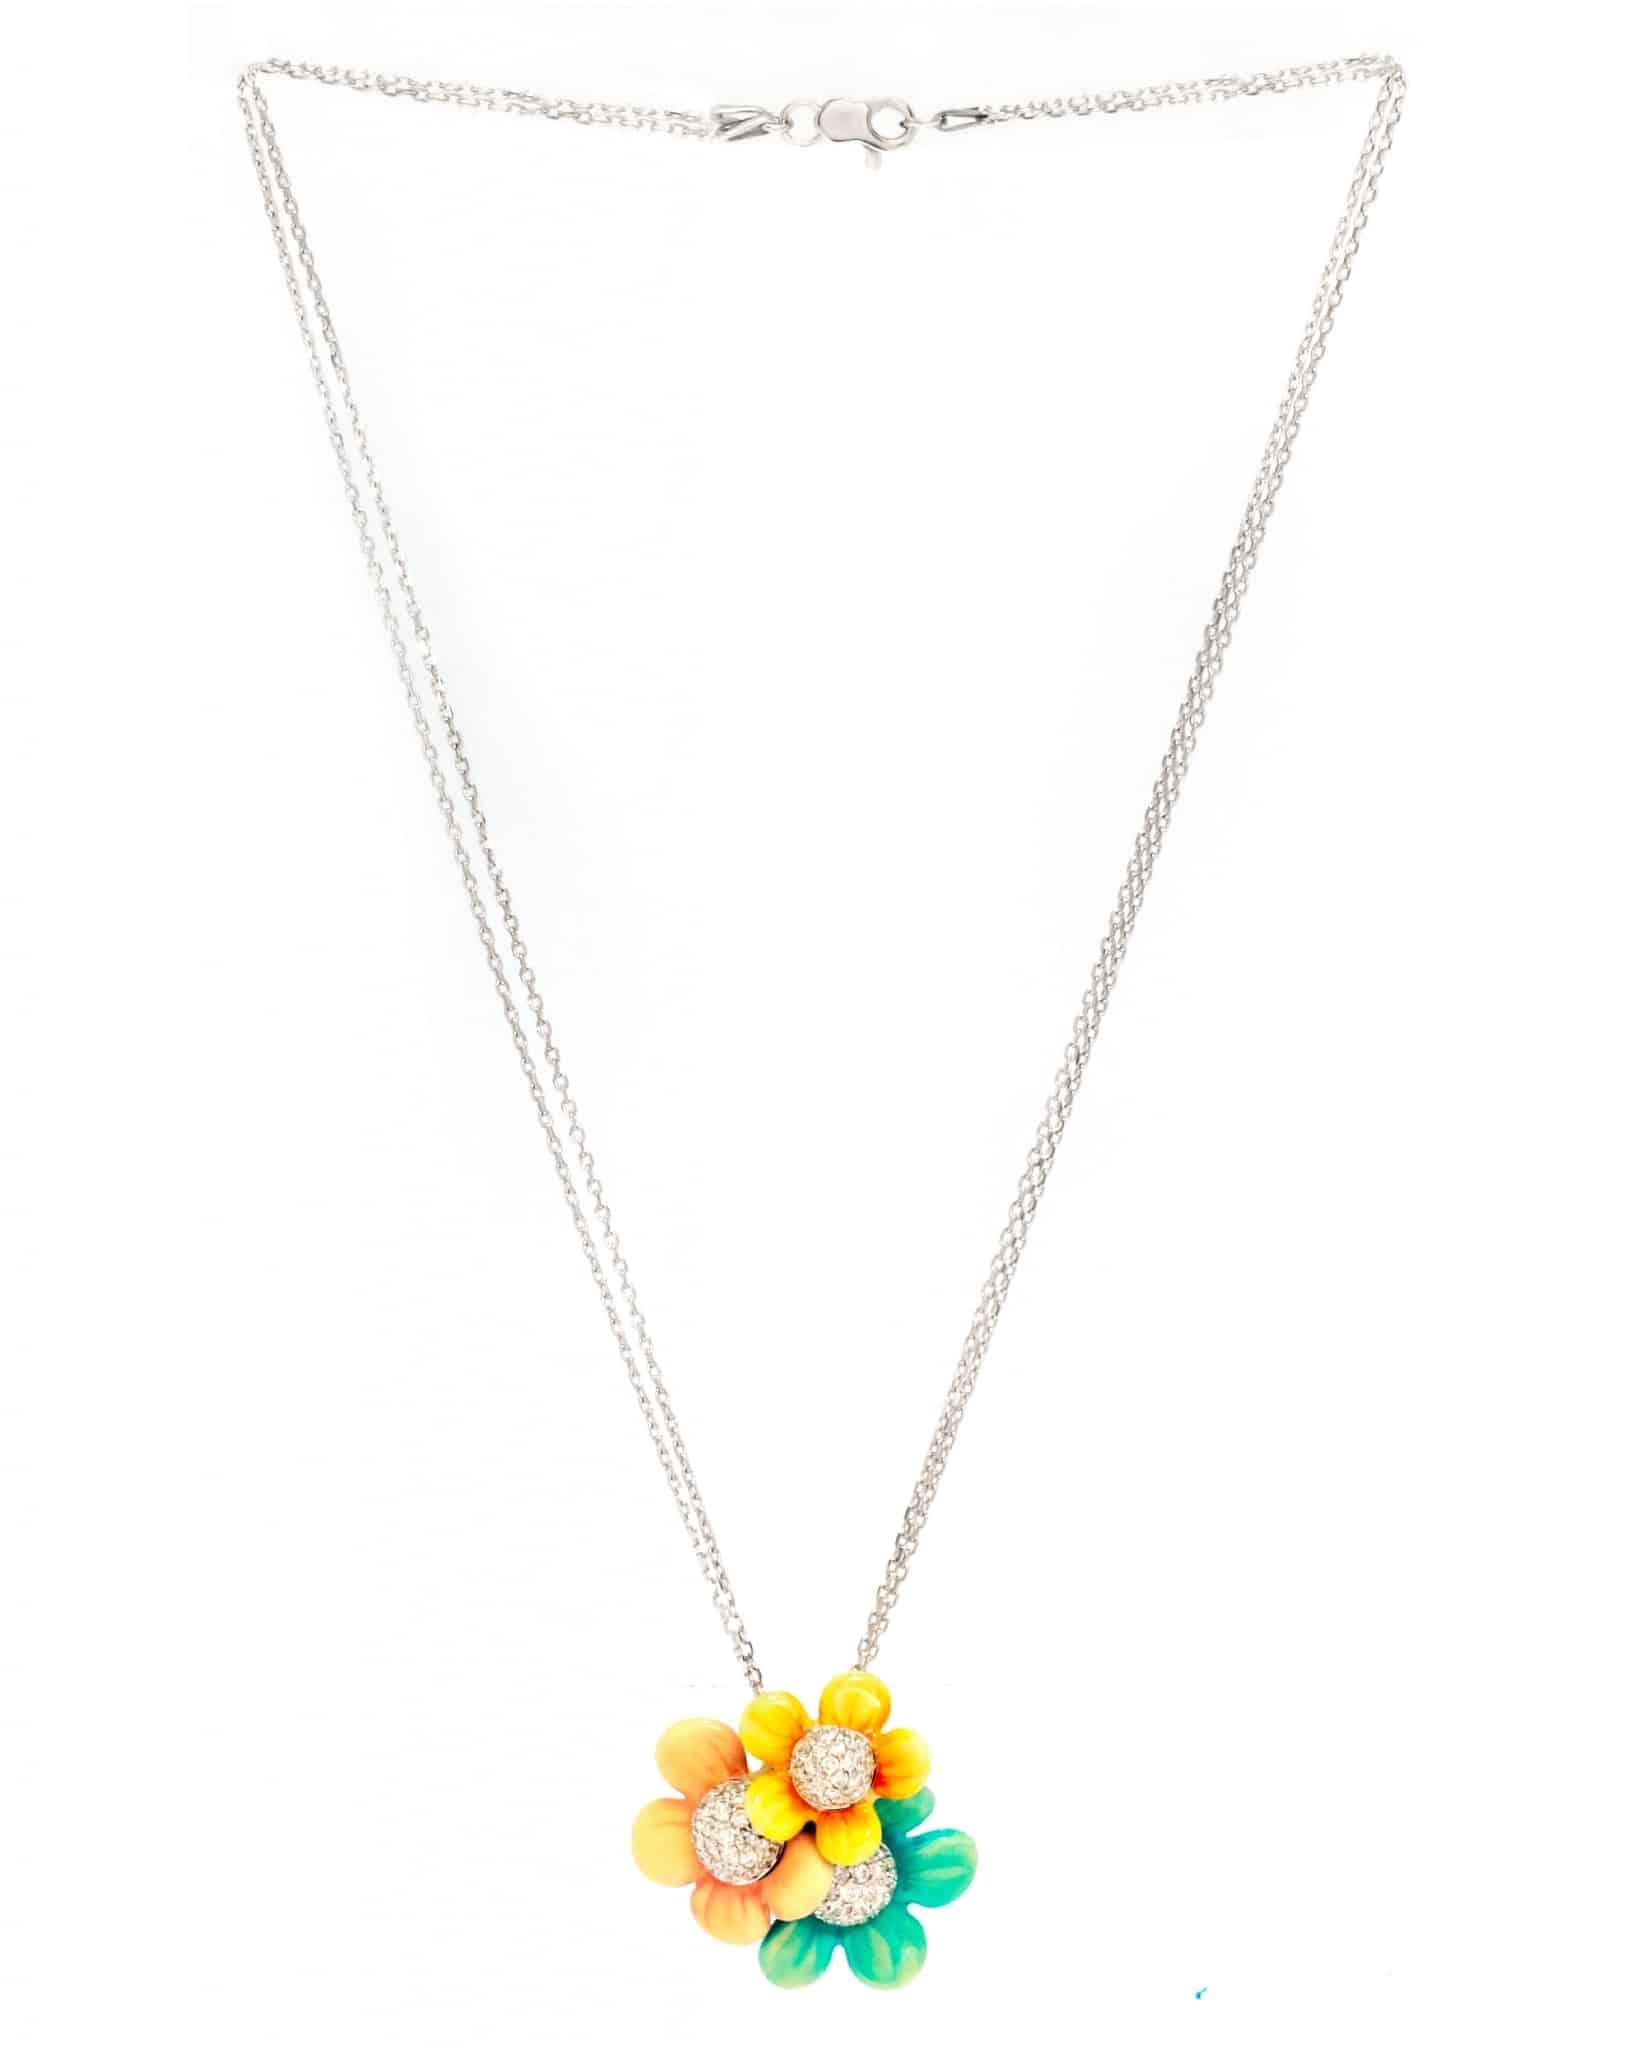 Bibigi 18K White Gold, Enamel And Diamond Necklace CLA2500B MSRP $17,000